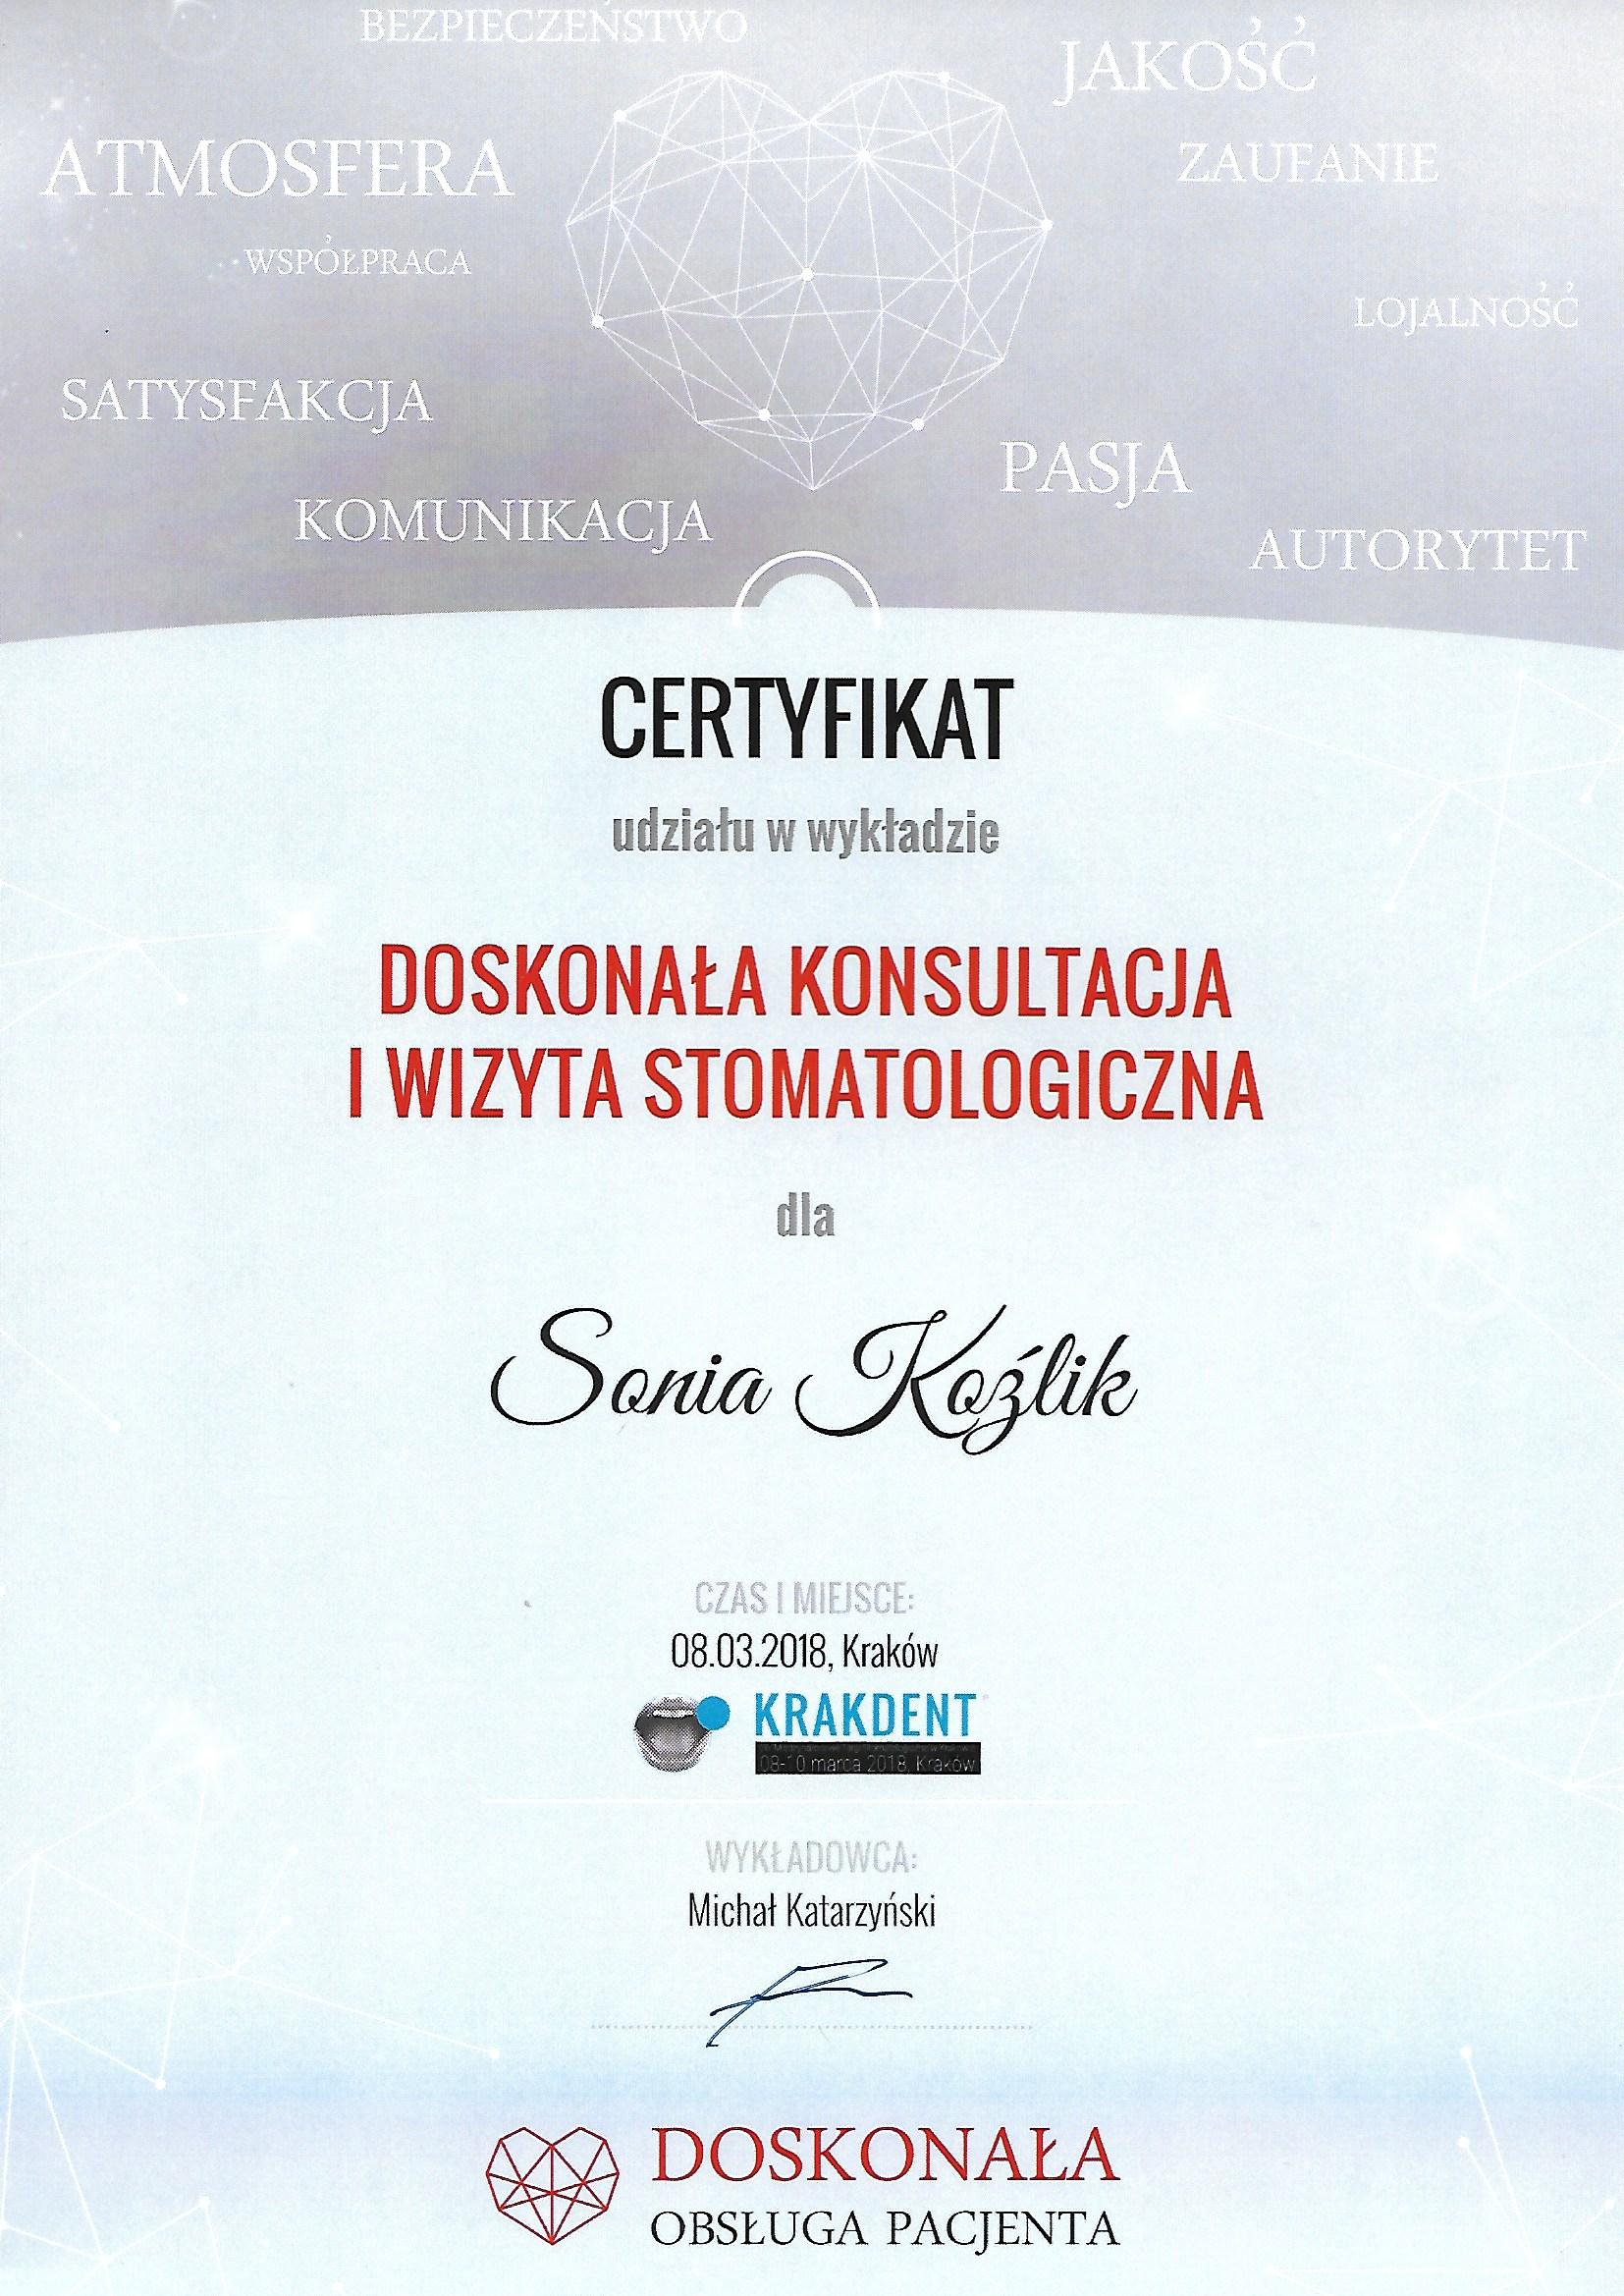 certyfikat sonia kozlik 8.03.18